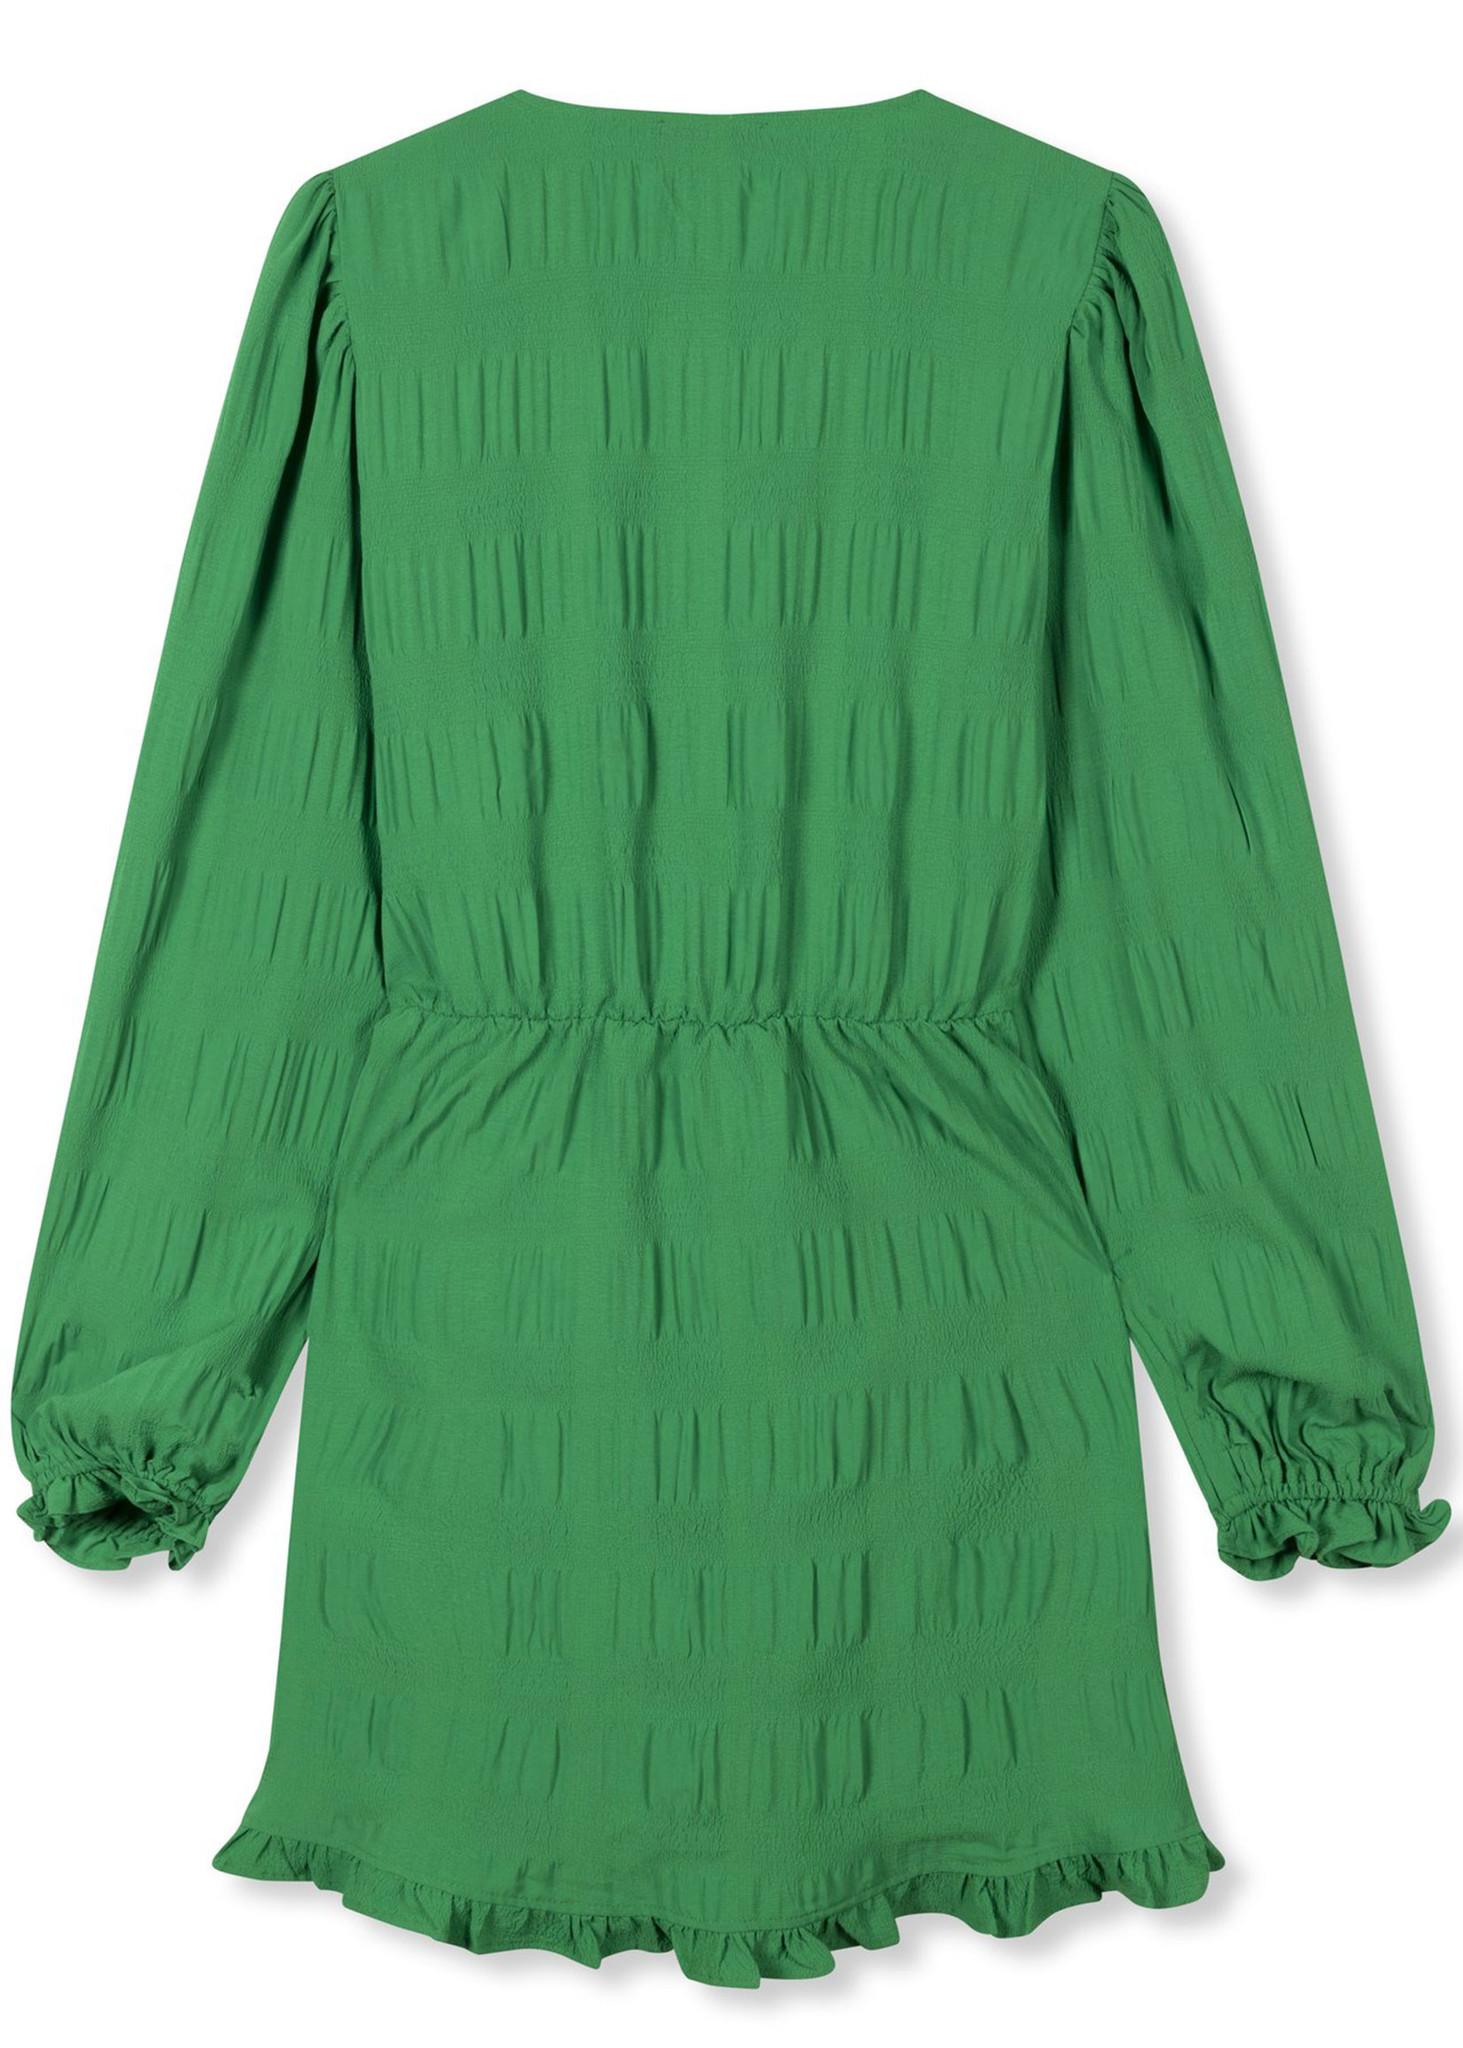 Woven Smock Dress Green-4